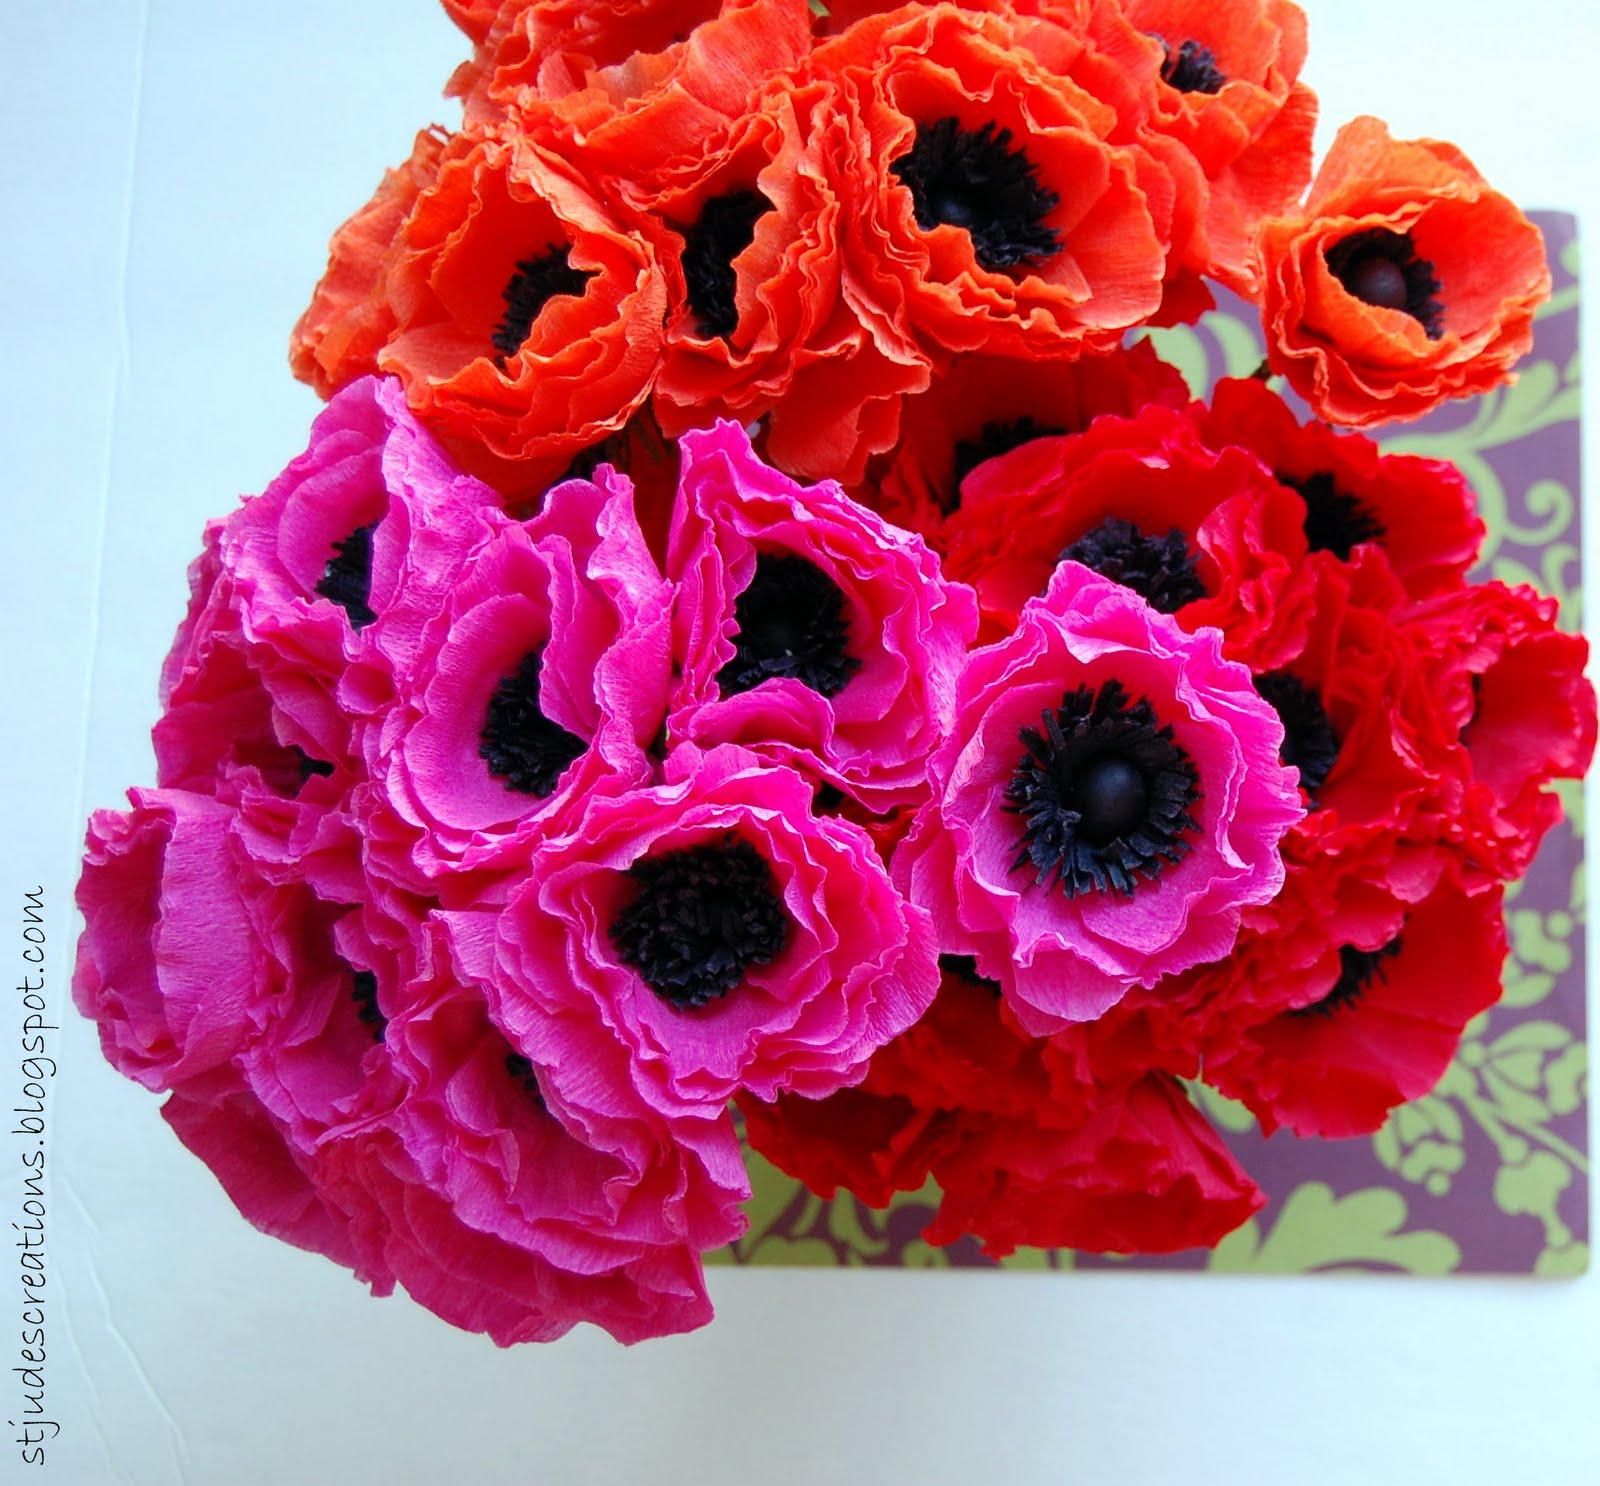 Hot Pinkred Orange Anemones Handmade Paper Flowers By Maria Noble